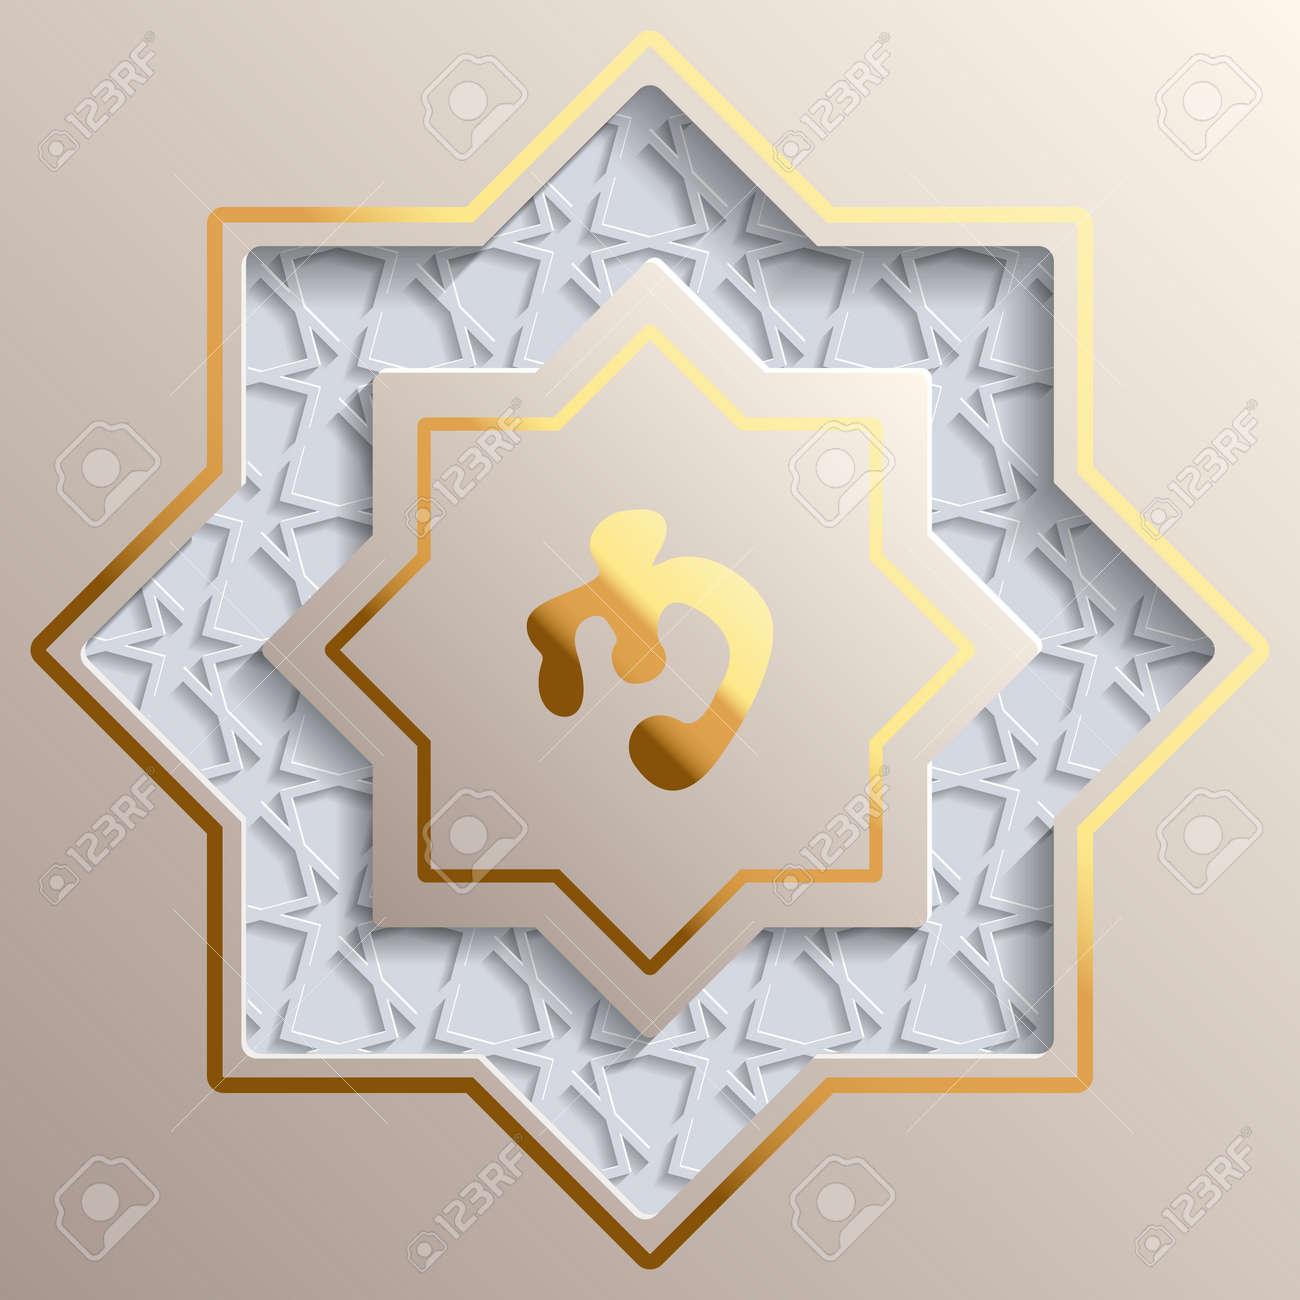 Islamic greeting card template for ramadan eid al fitr festival islamic greeting card template for ramadan eid al fitr festival of breaking of the kristyandbryce Image collections